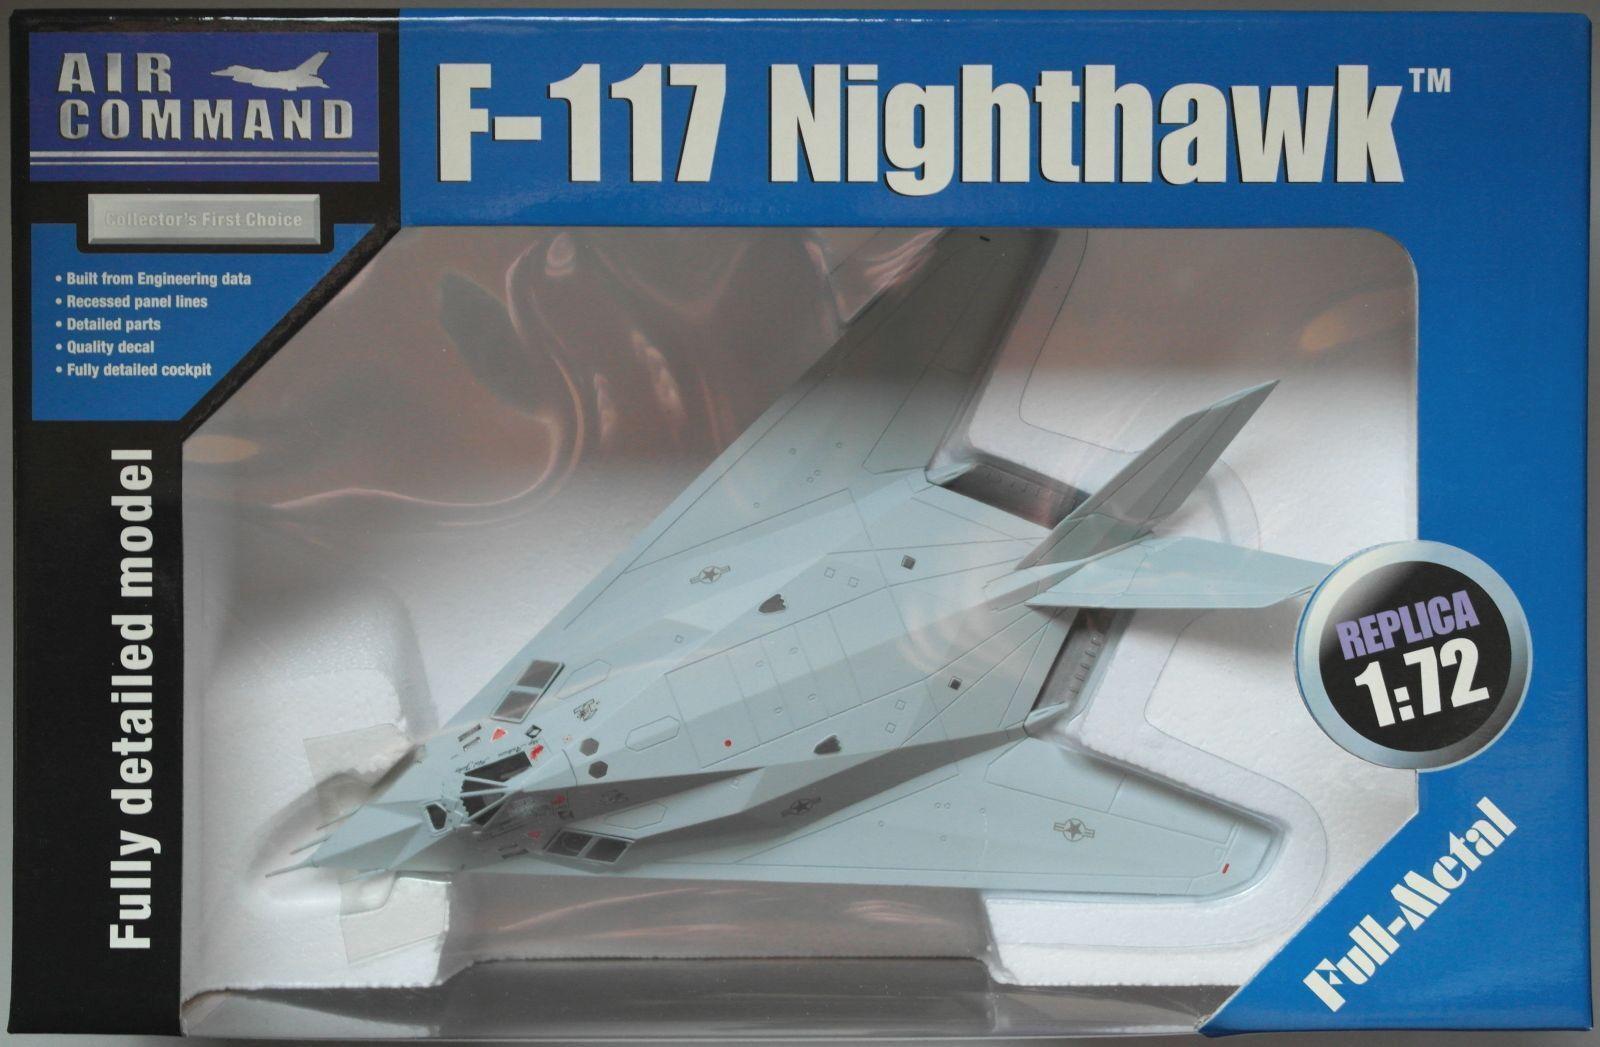 SUN STAR AIR COMMAND f-117 Nighthawk US Air Force Scorpion Scorpion Scorpion 1 1 72 Nouveau Neuf dans sa boîte Bâche 3ae0f9